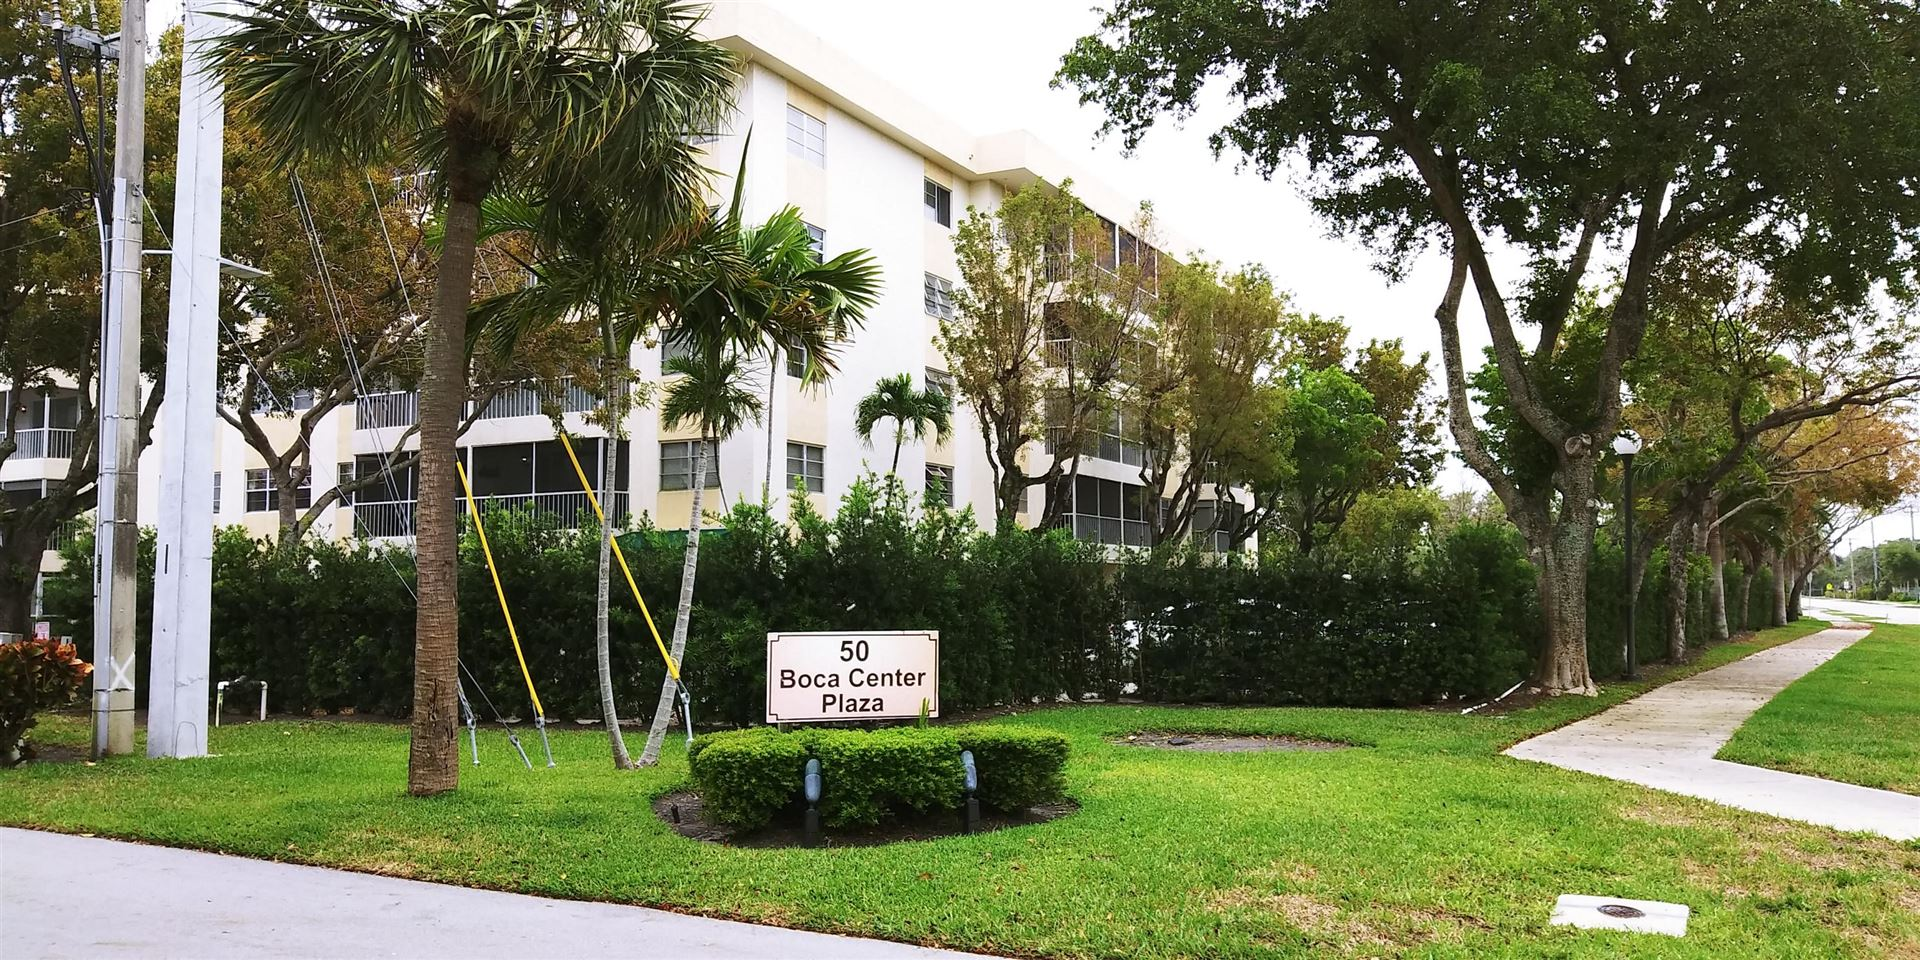 Photo of 50 SW 3rd Avenue #5010, Boca Raton, FL 33432 (MLS # RX-10709763)